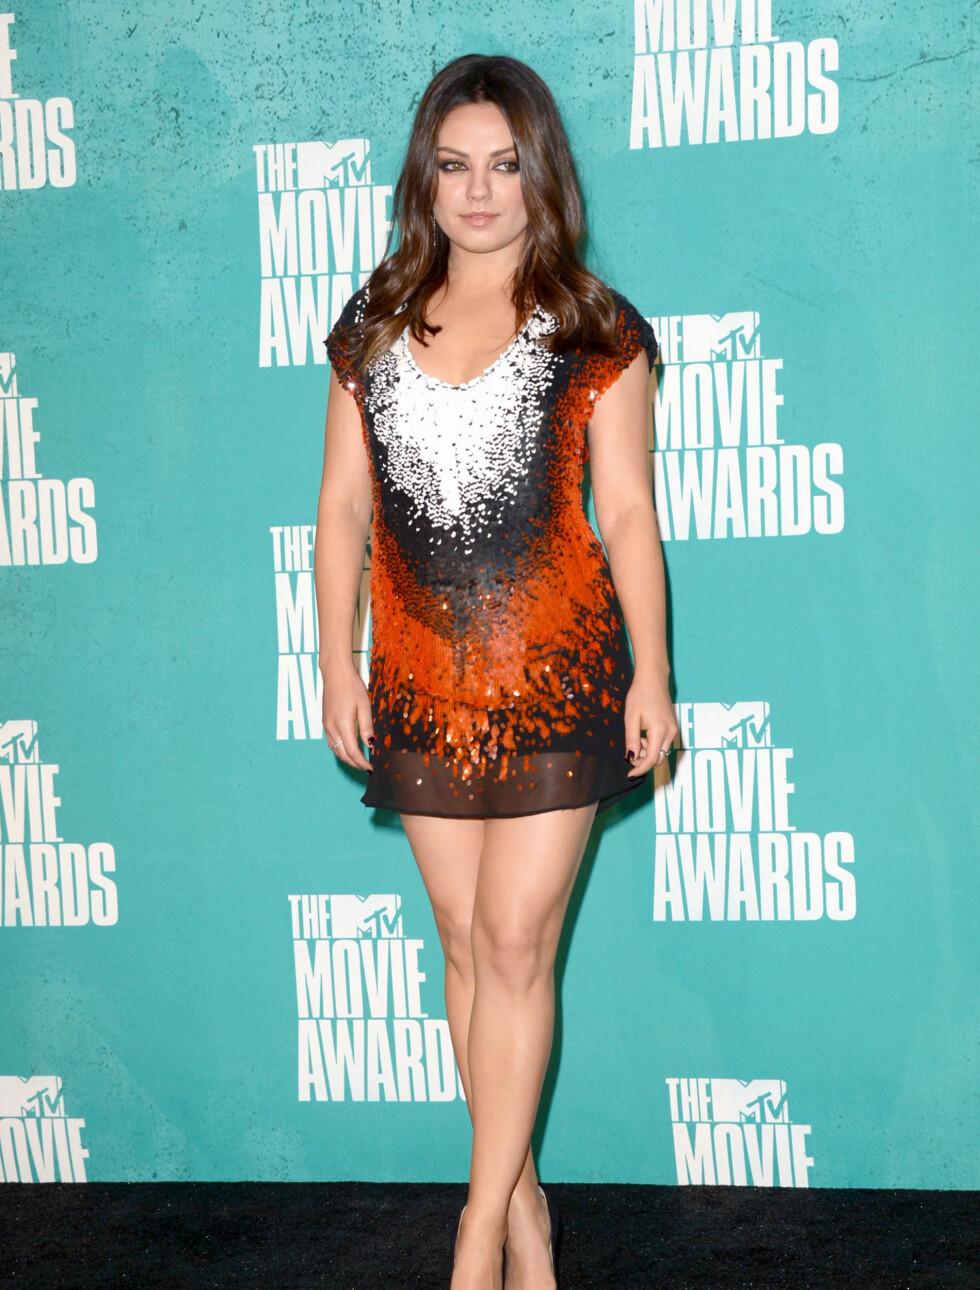 MØNSTER: Skuespiller Mila Kunis valgte en mønstrete minikjole. Foto: All Over Press